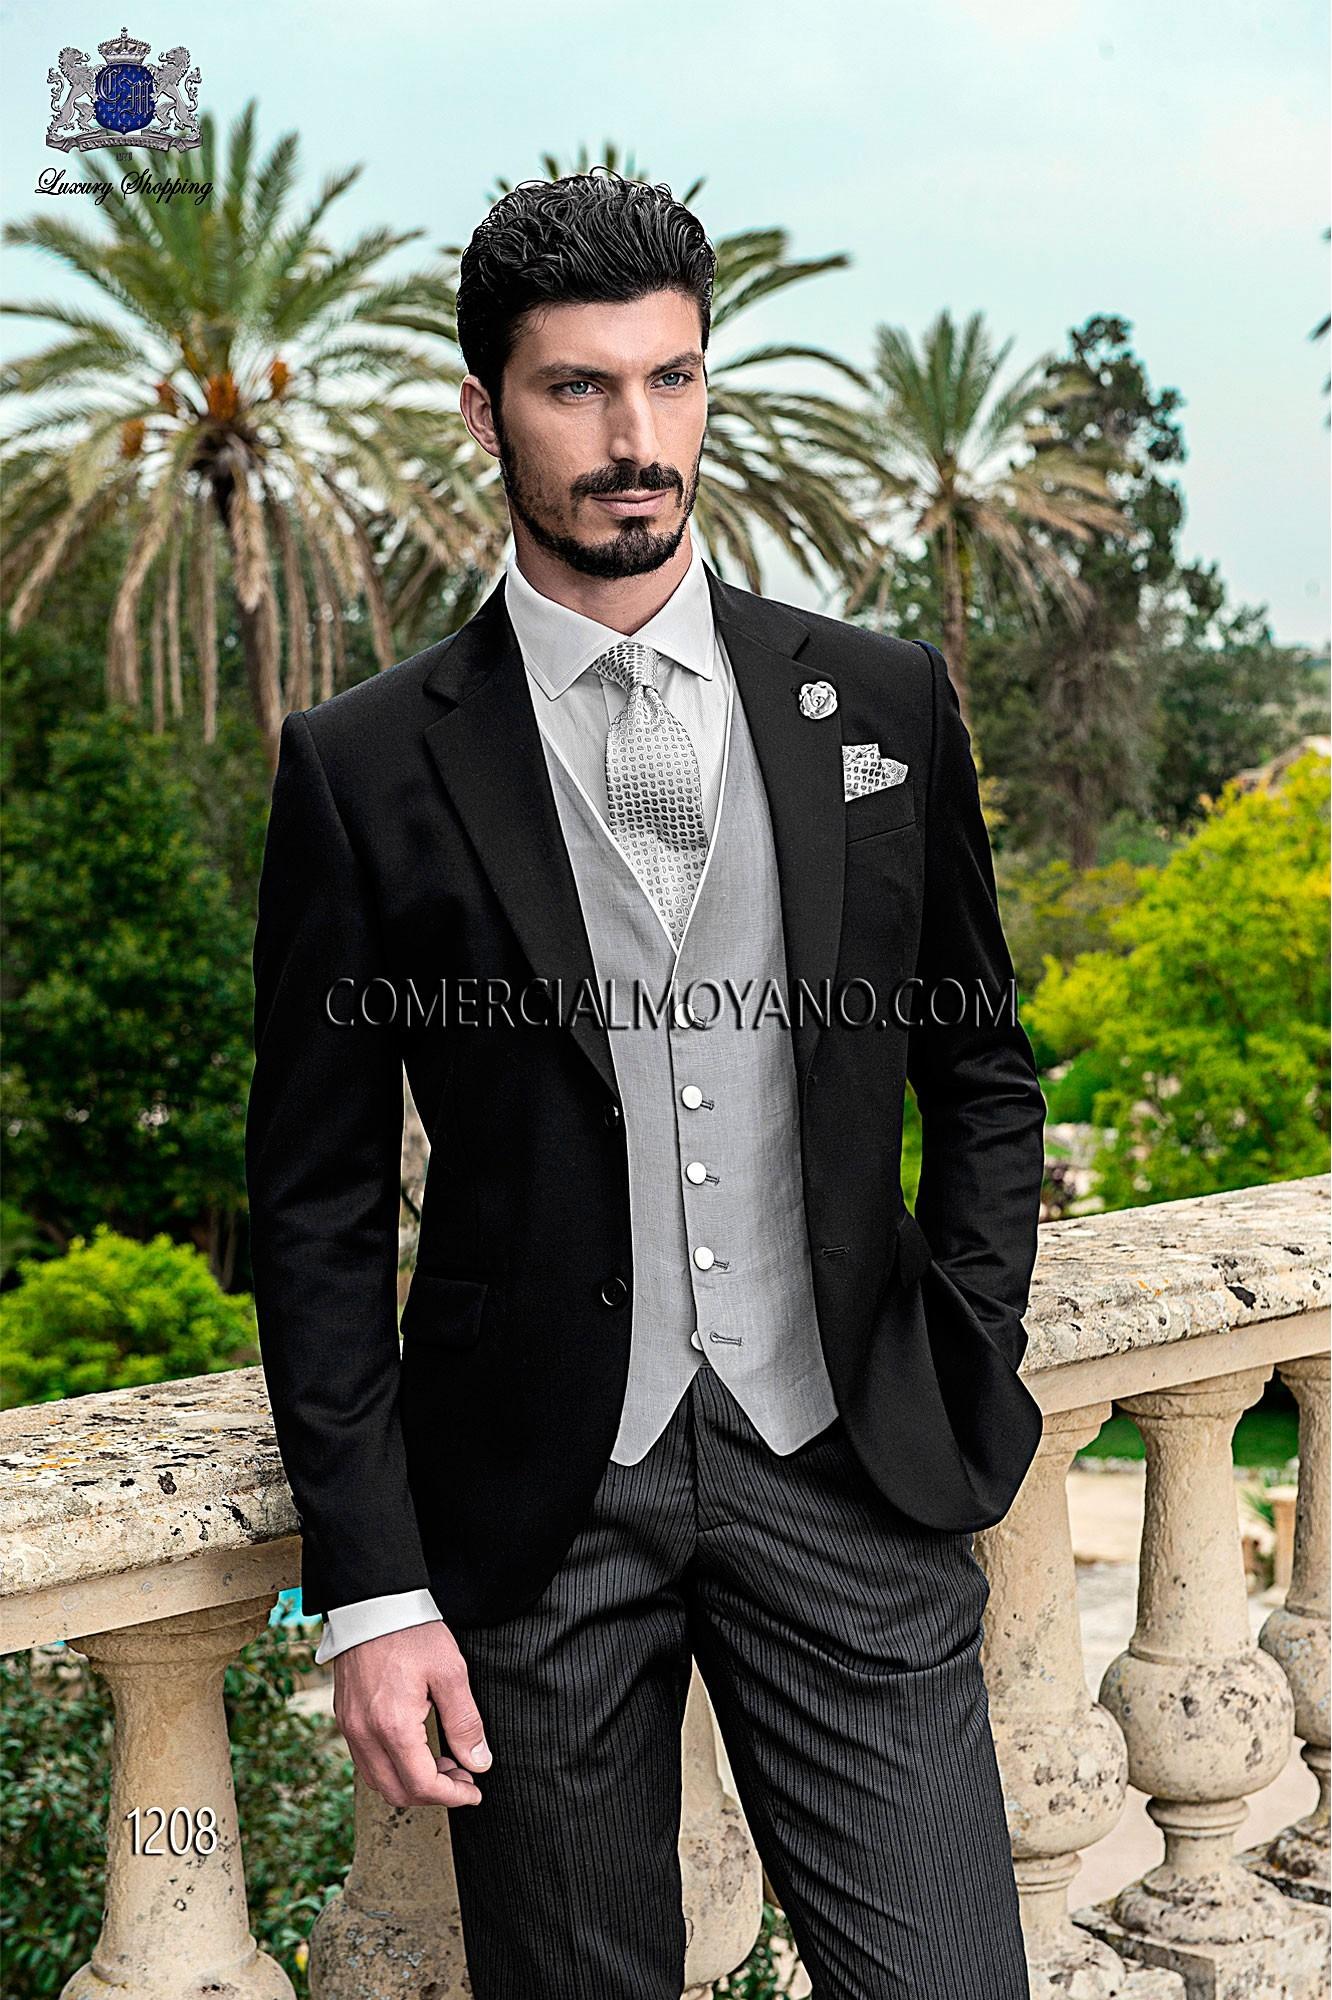 Gentleman black men wedding suit model 1208 Ottavio Nuccio Gala